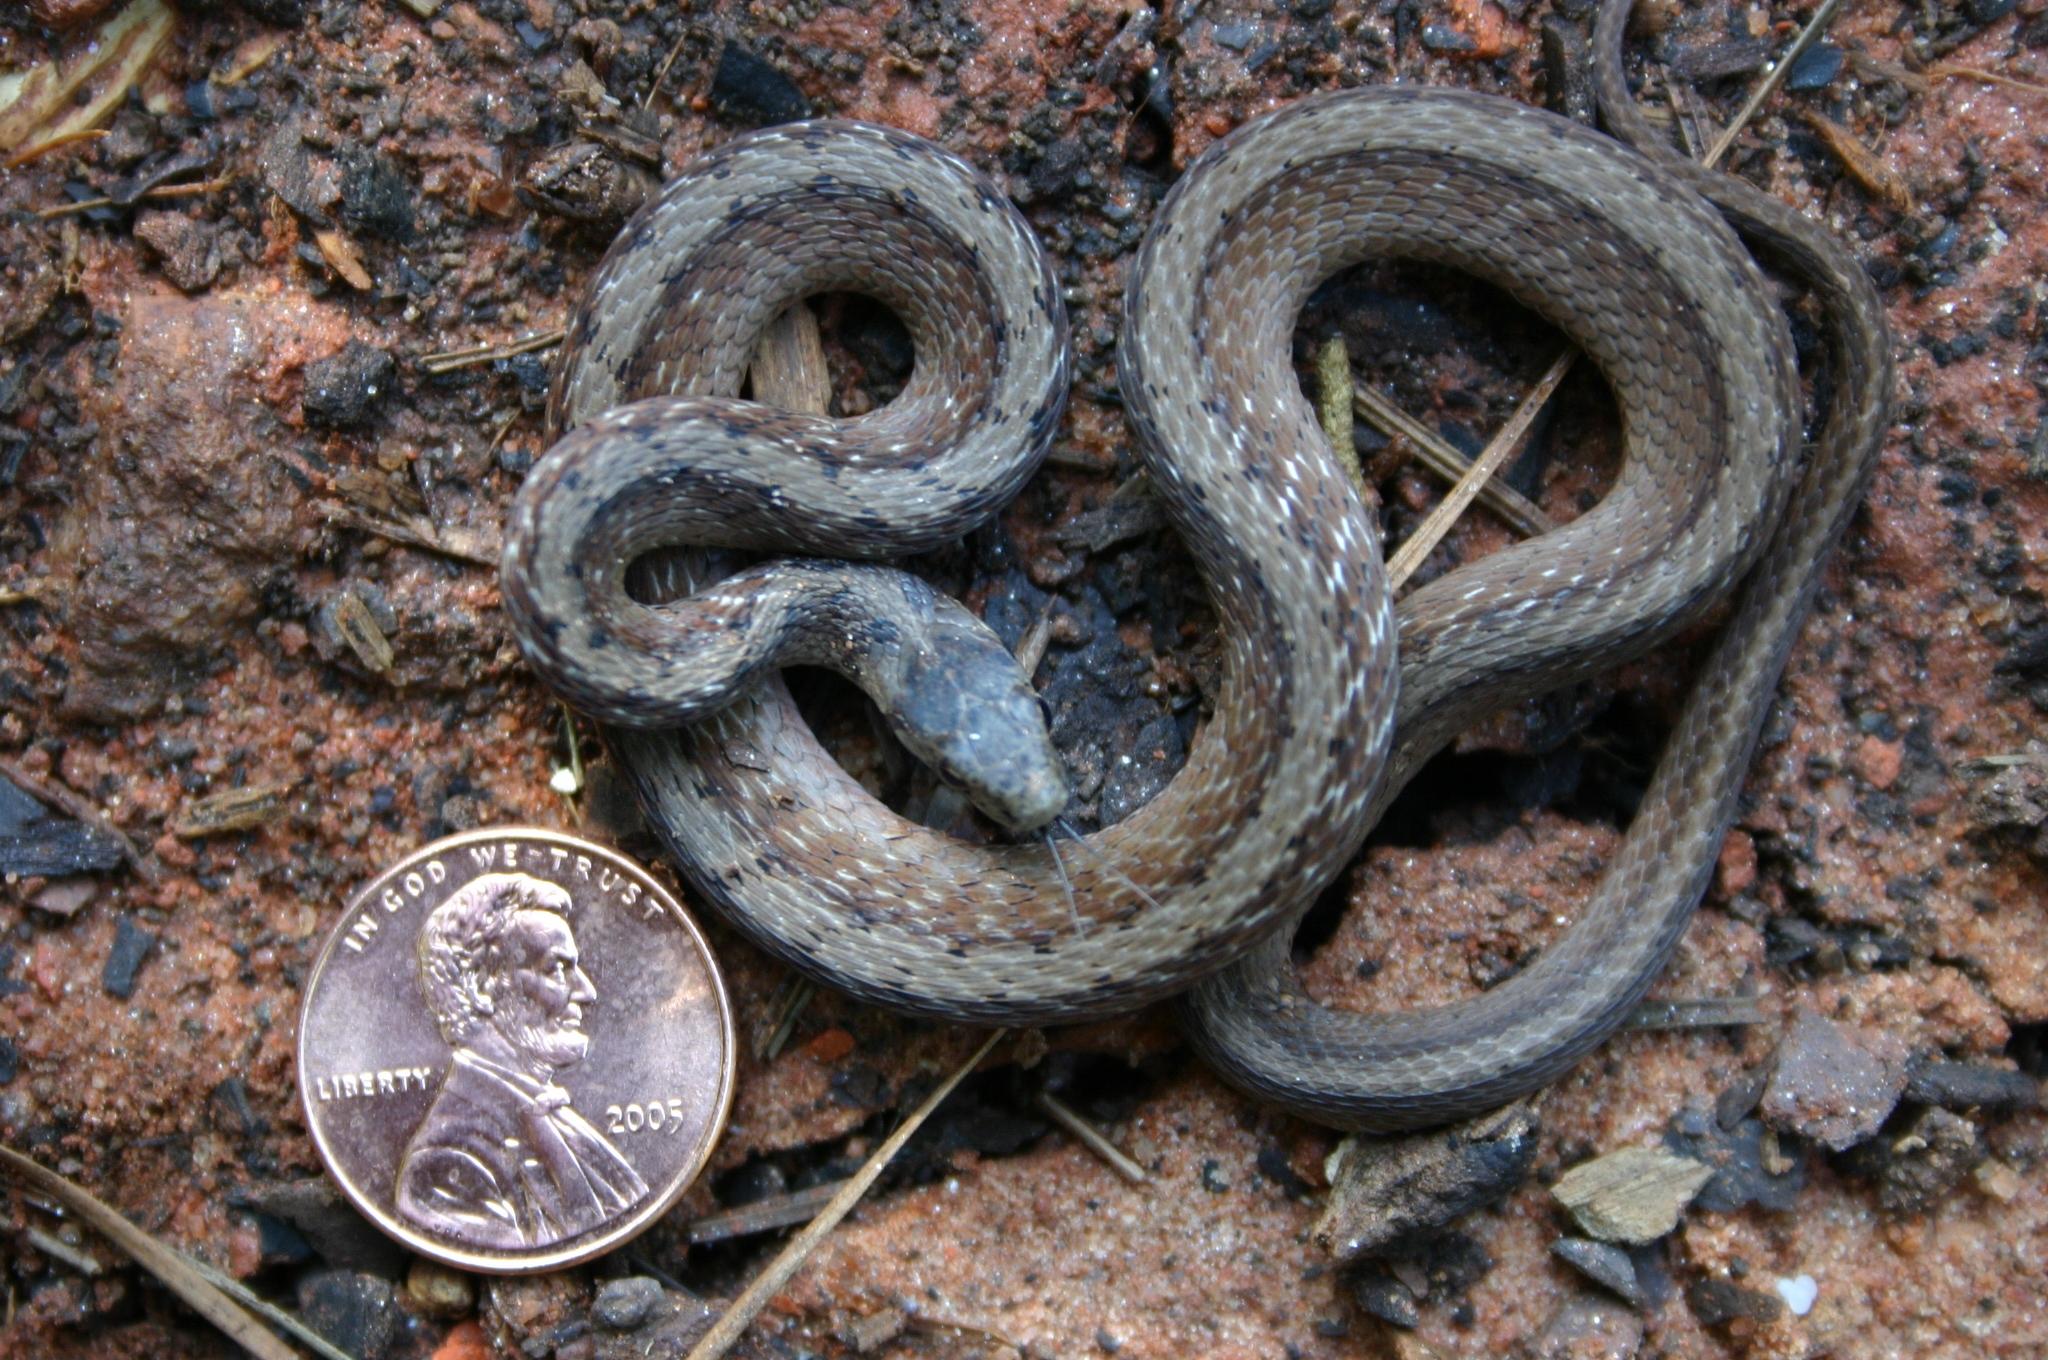 brown garden snake